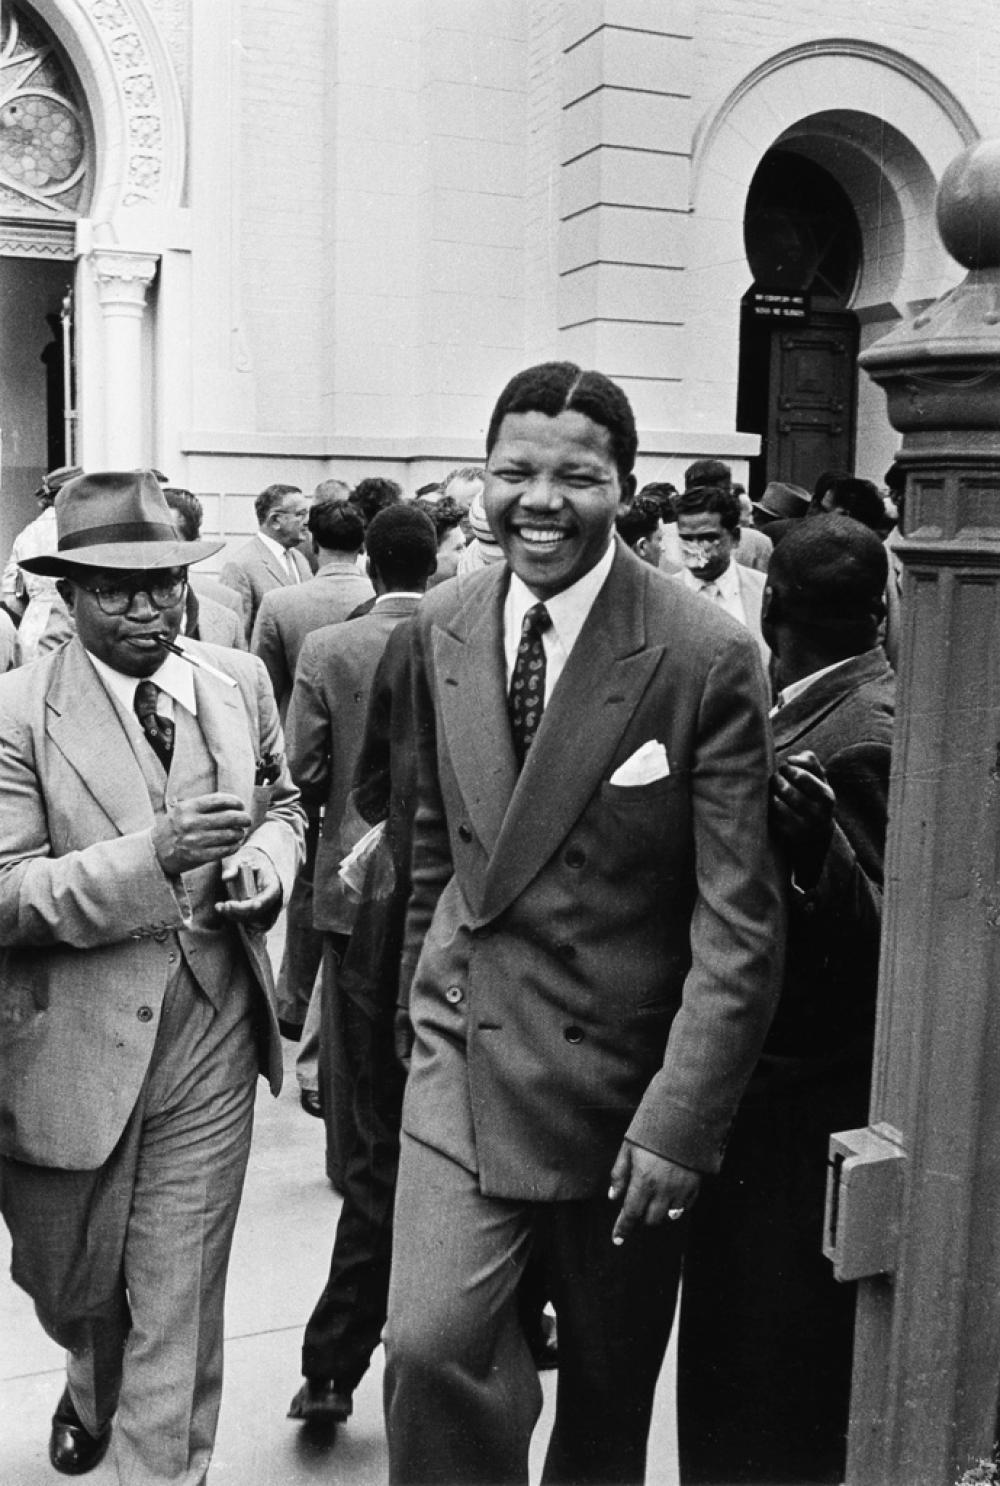 JÜRGEN SCHADEBERG (1931- ) Nelson Mandela and Moses Kotane During the Treason Trial in Pretoria.